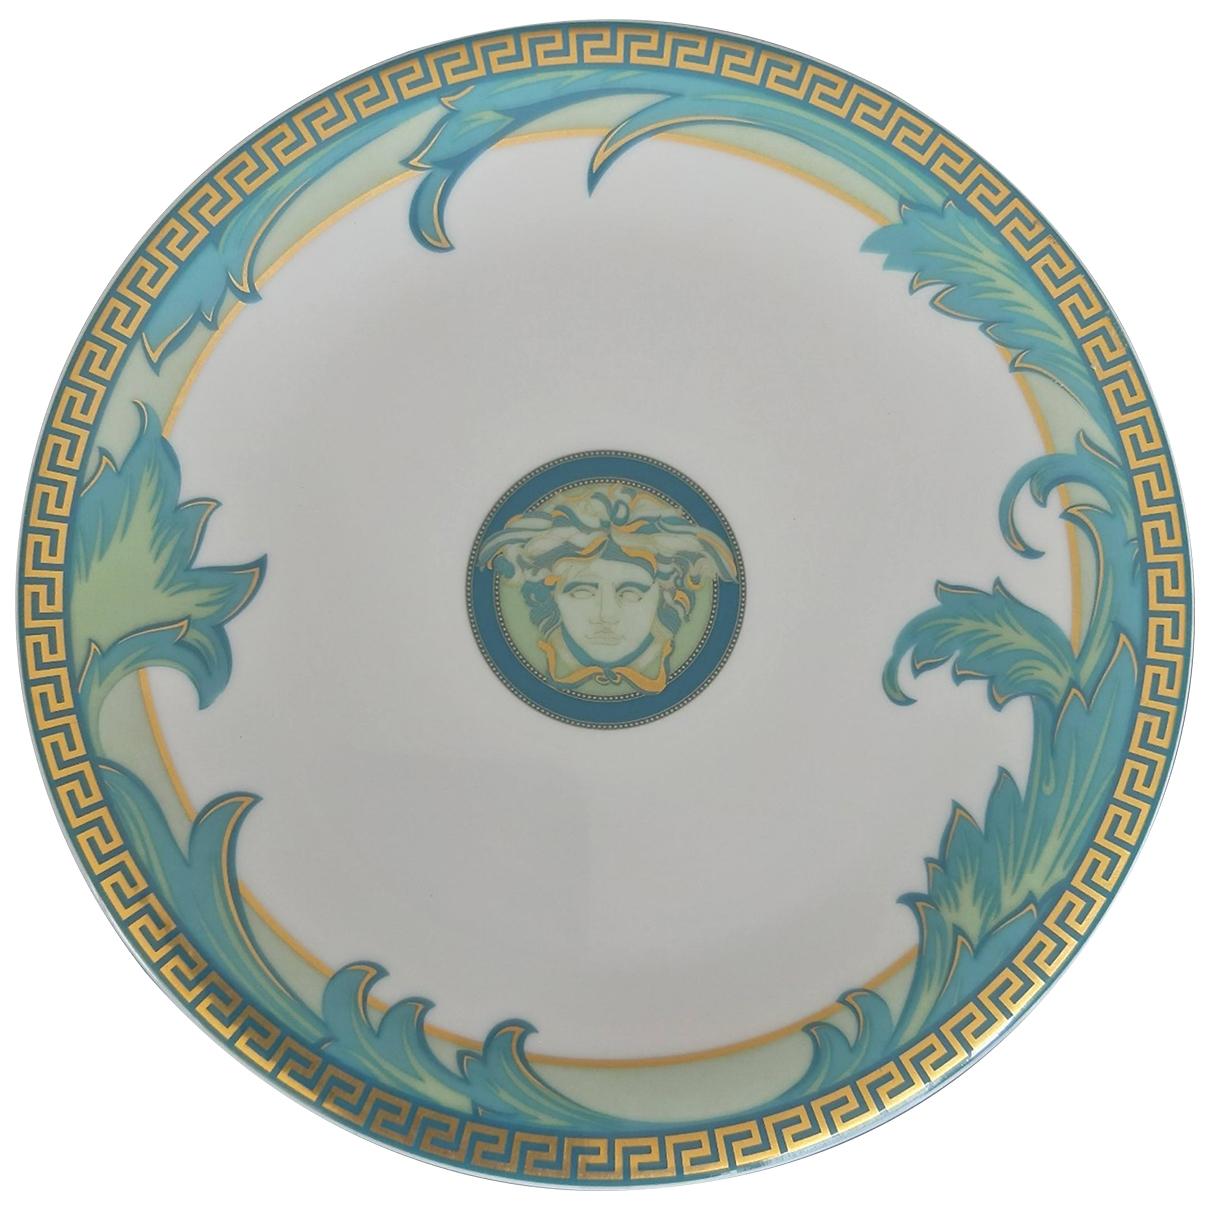 Plato de Porcelana Gianni Versace